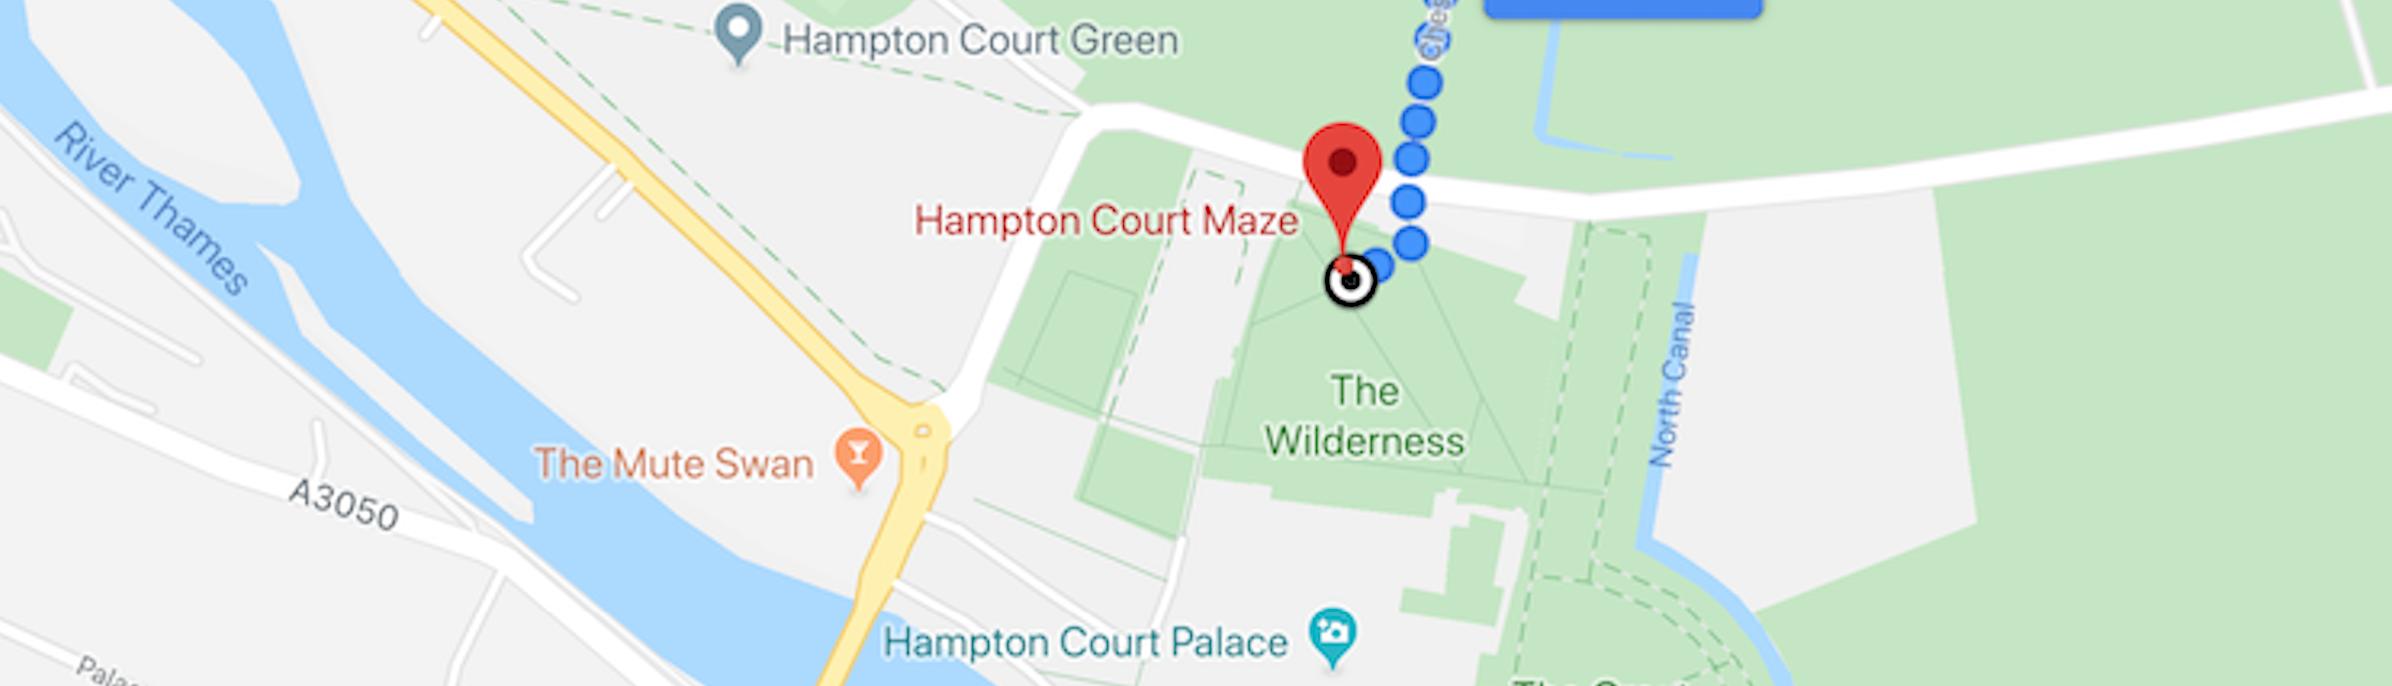 maze | Reflections on Technology, Media & Culture